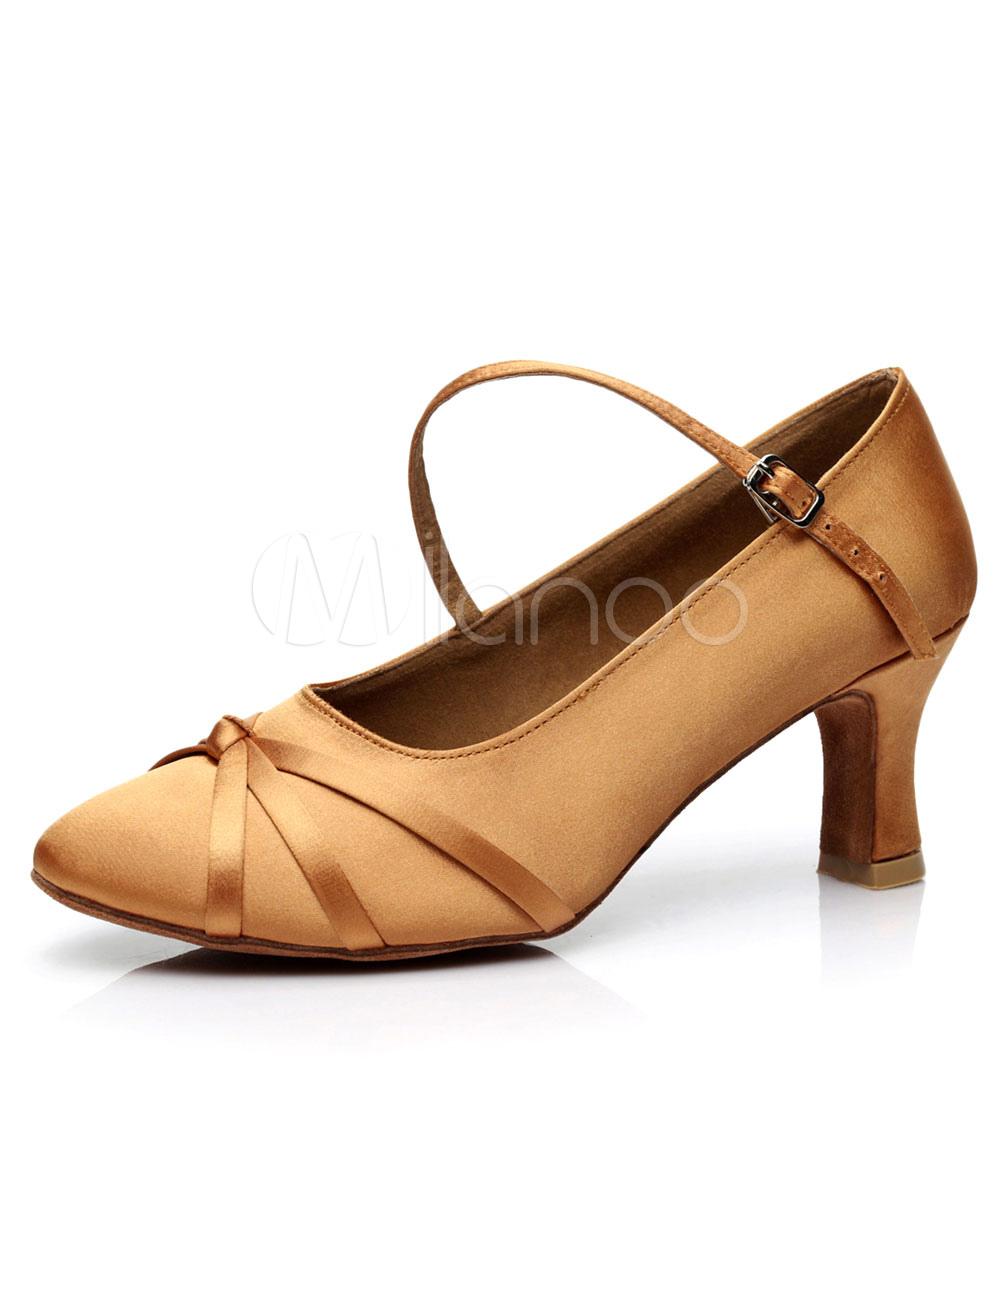 Light Brown Dance Pumps Satin Heels for Women